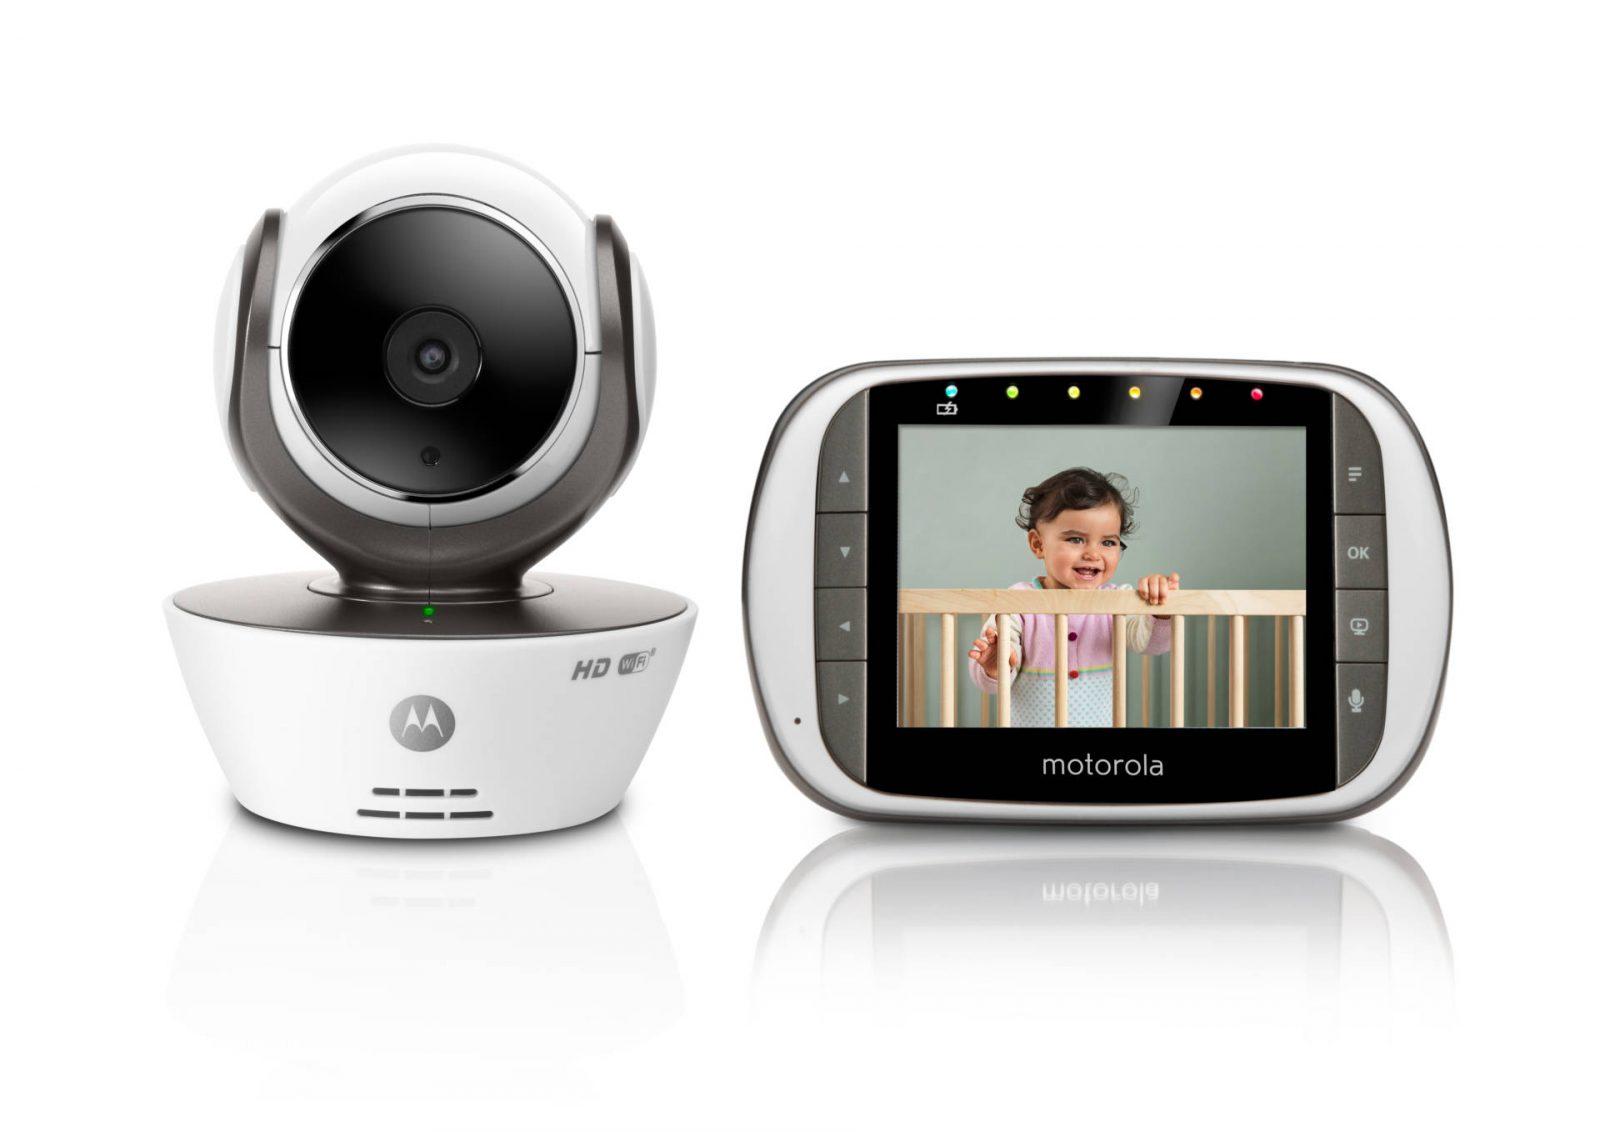 Win a fabulous Motorola Video Baby Monitor worth £169.99